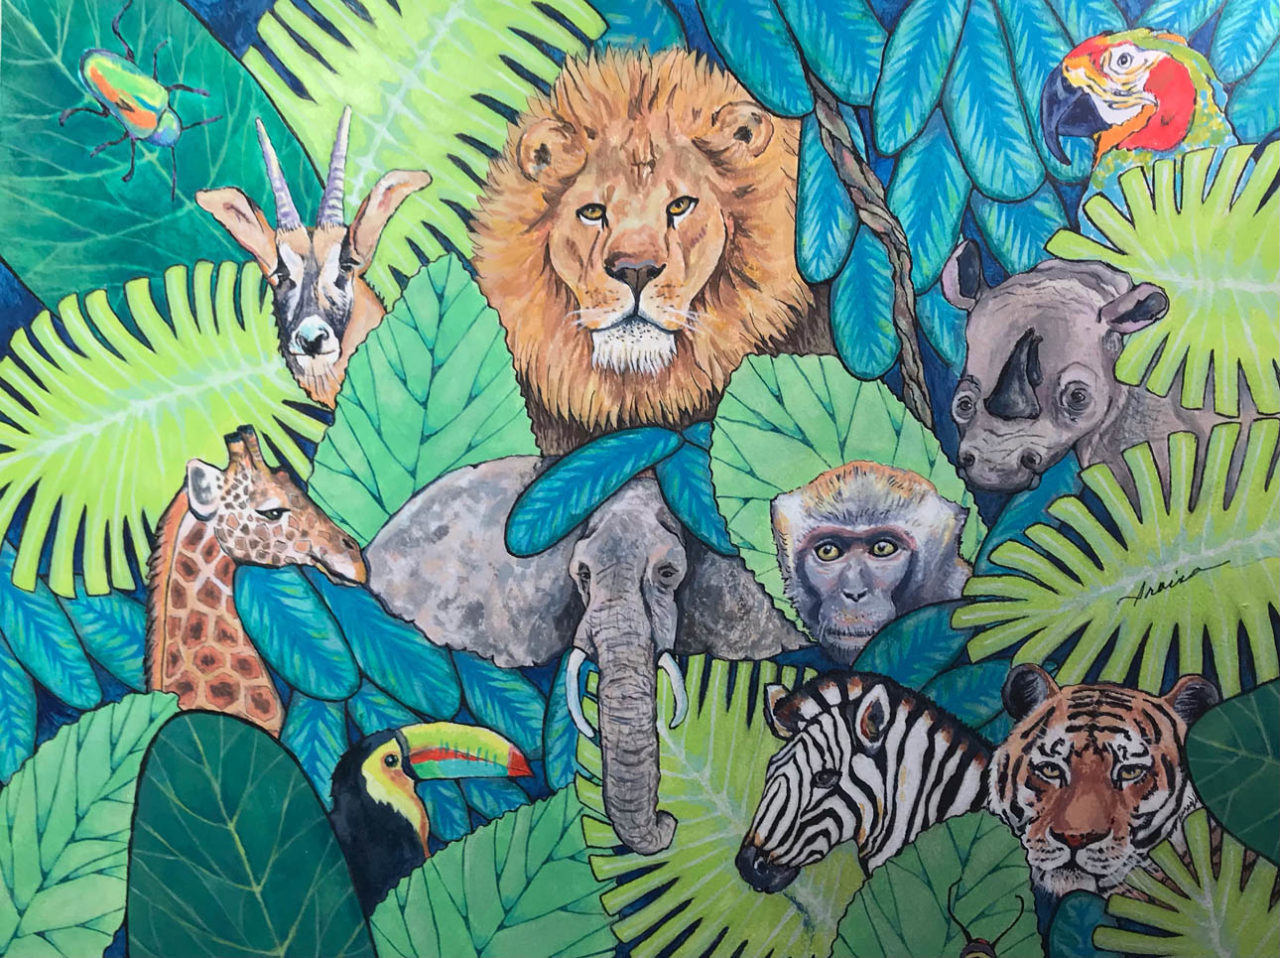 Protect Our Wildlife - Iraina Caramelli